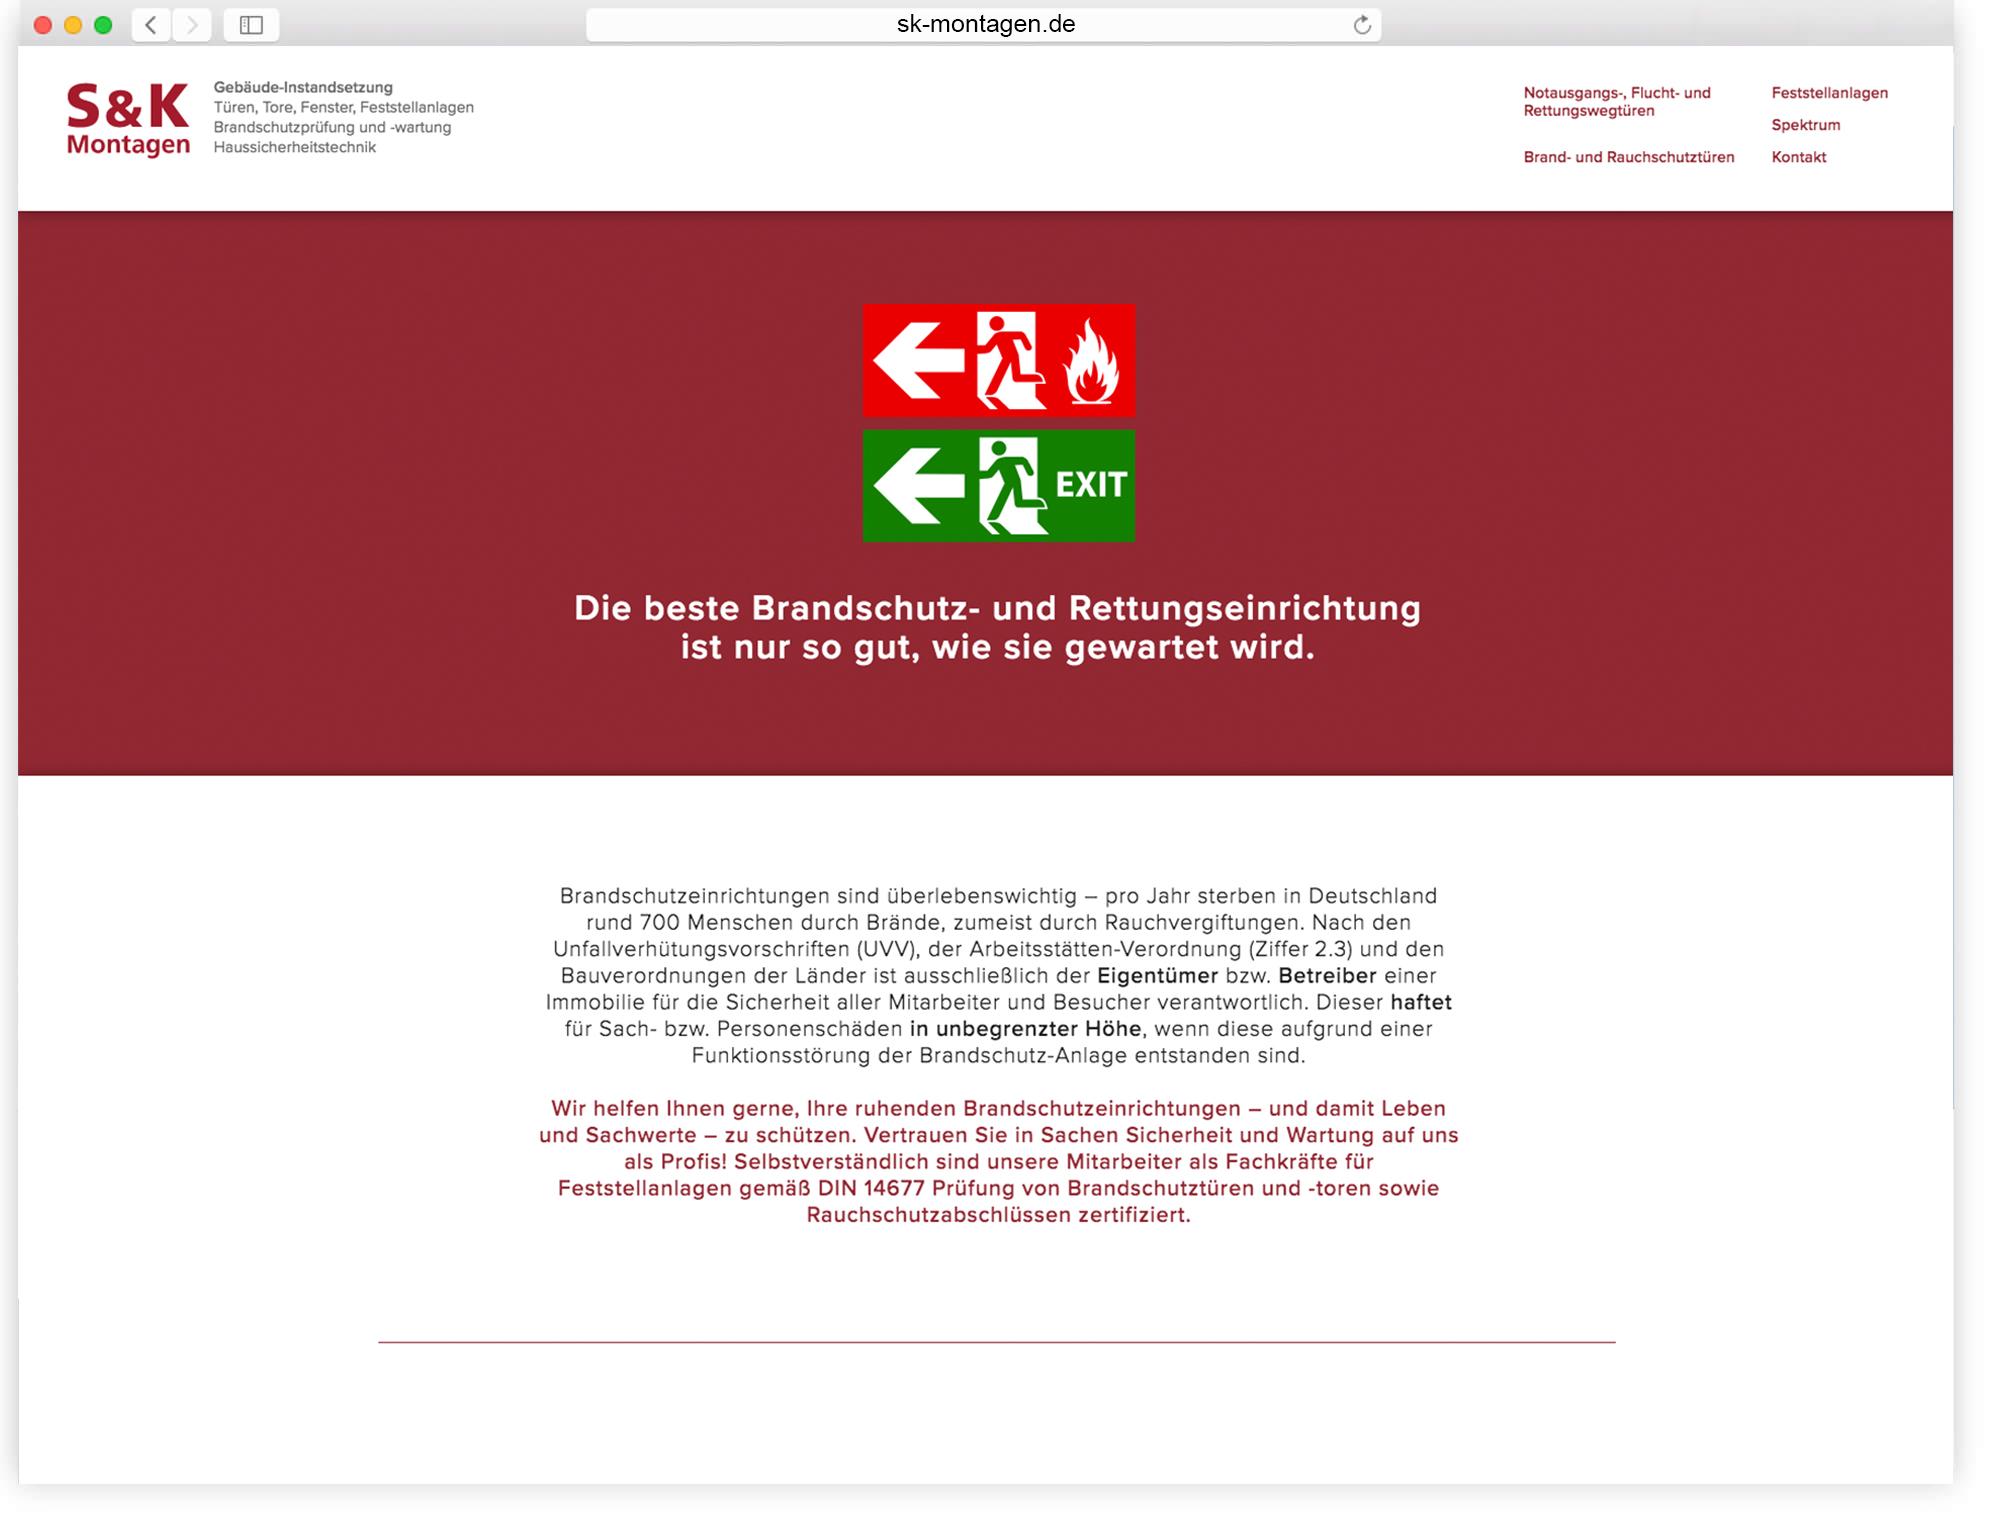 fh-web-sk-montagen.jpg